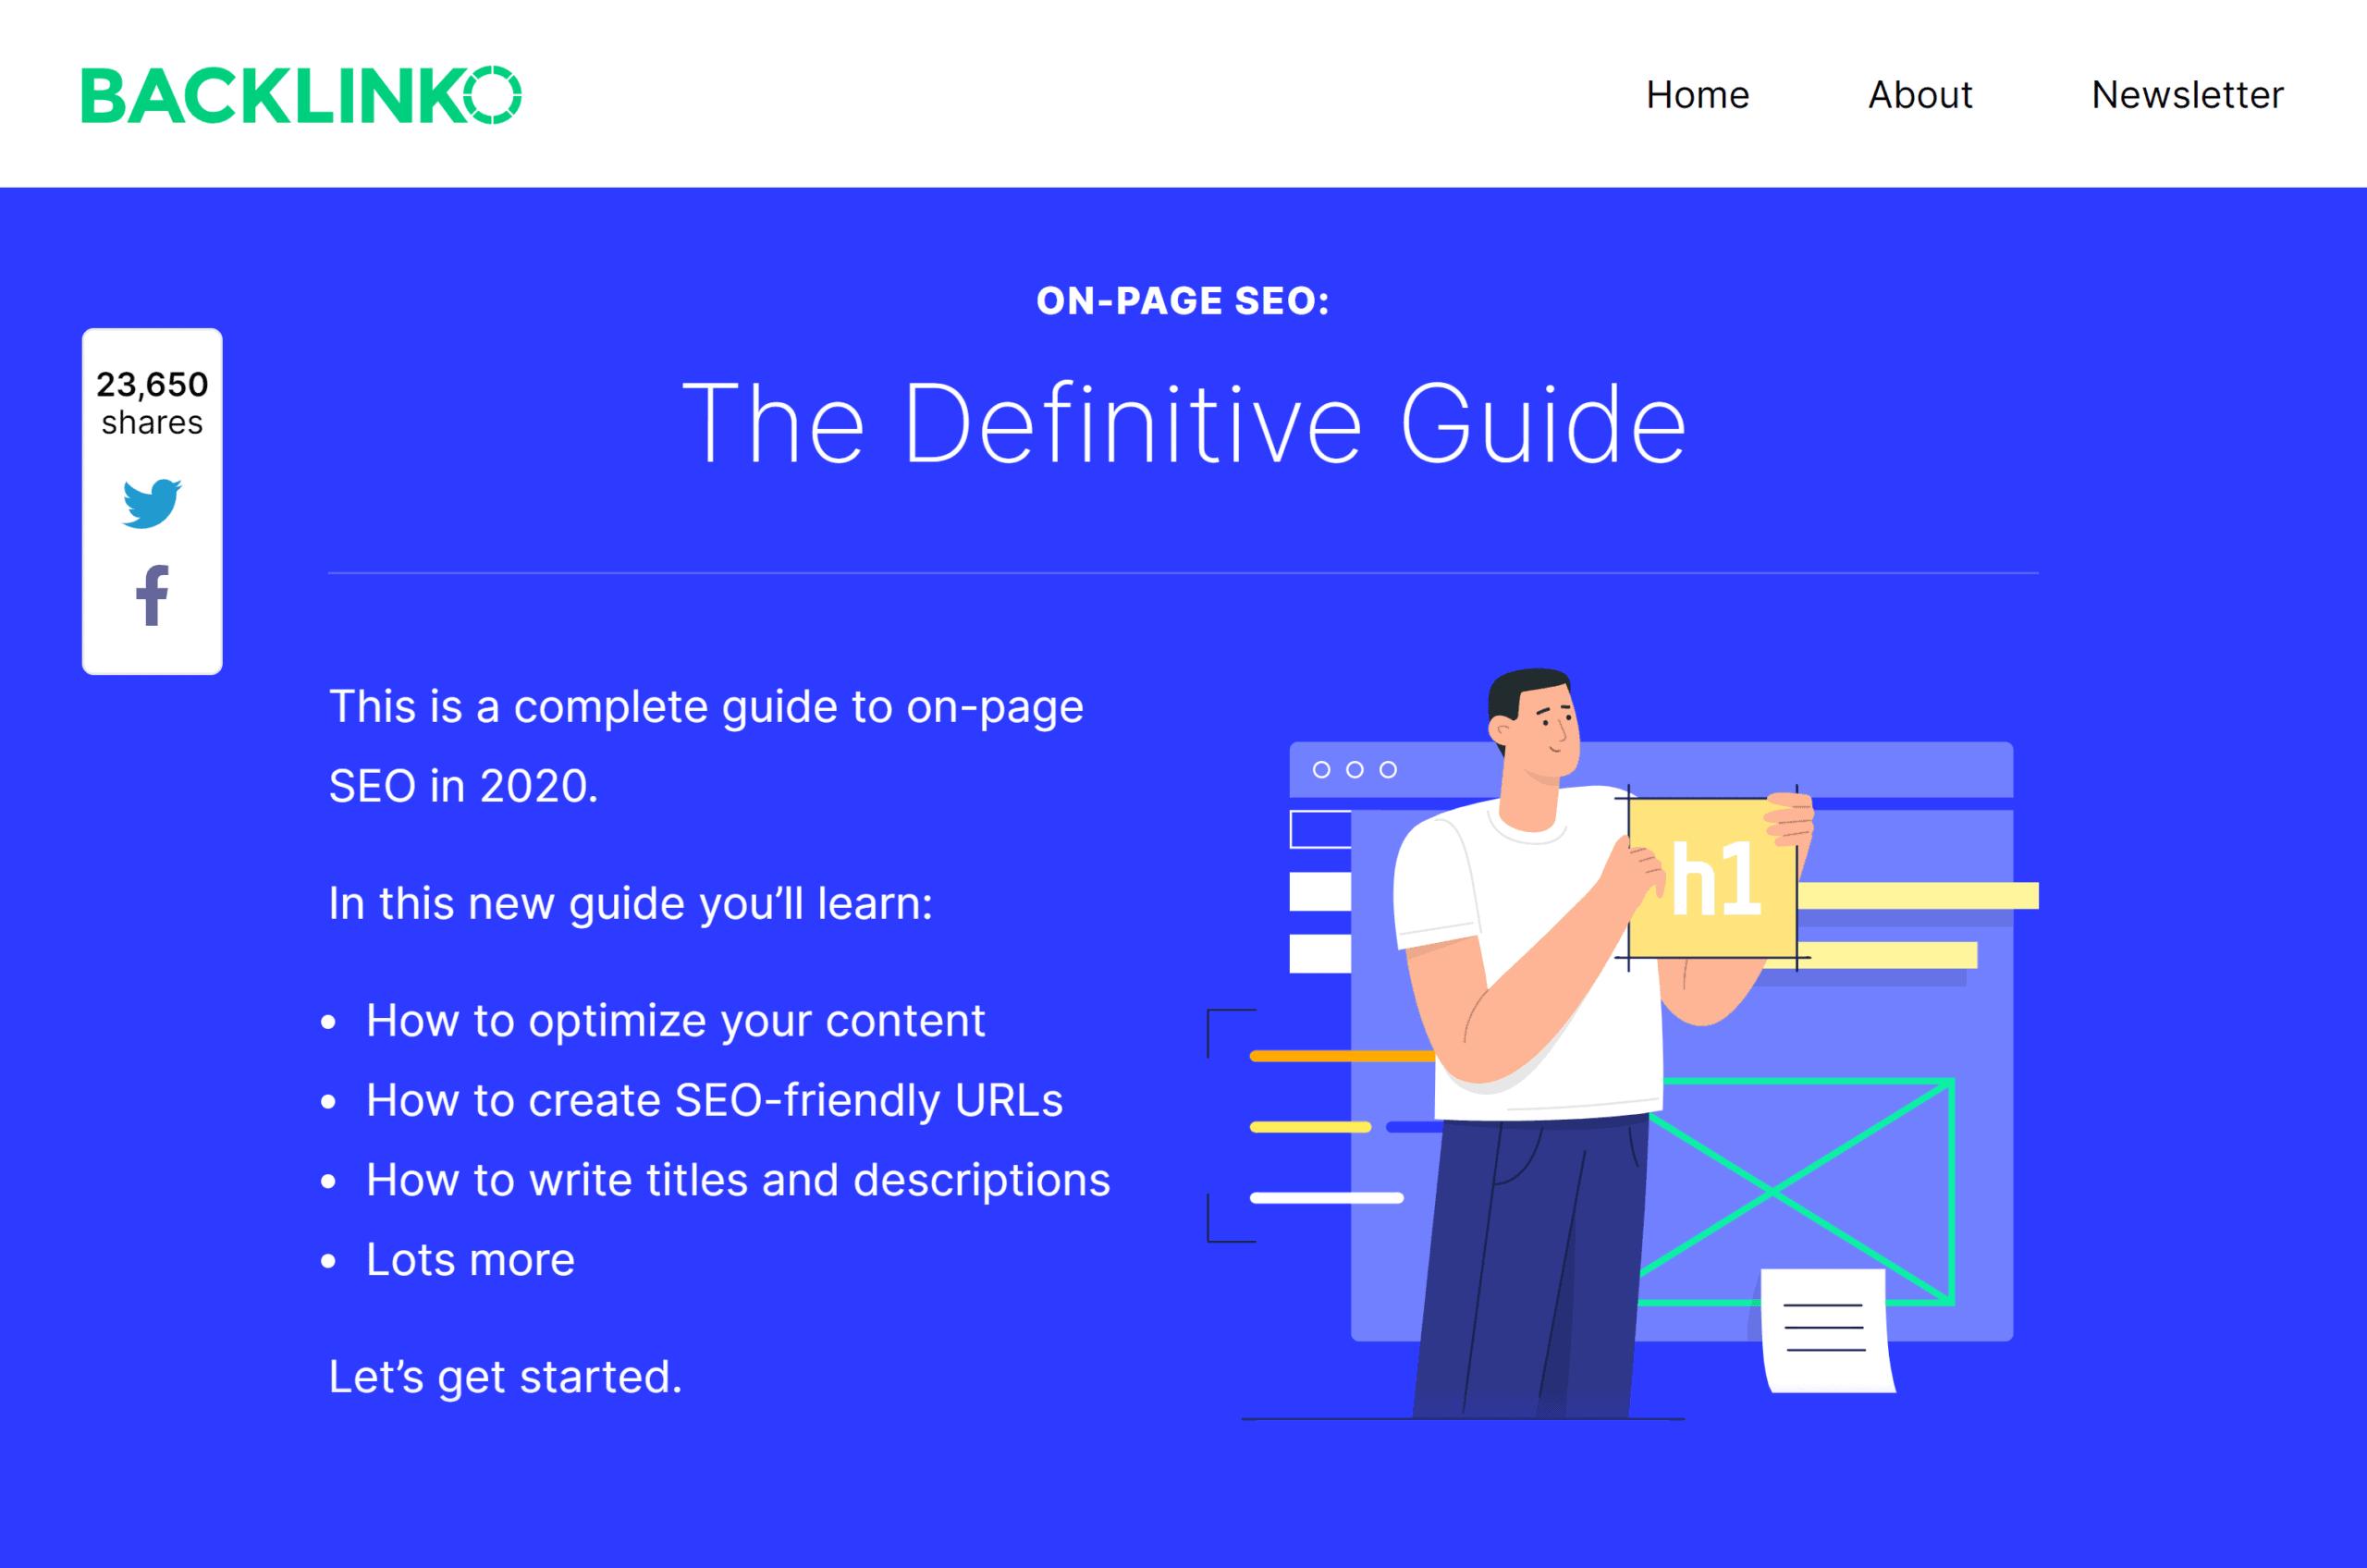 Backlinko – On-page SEO guide